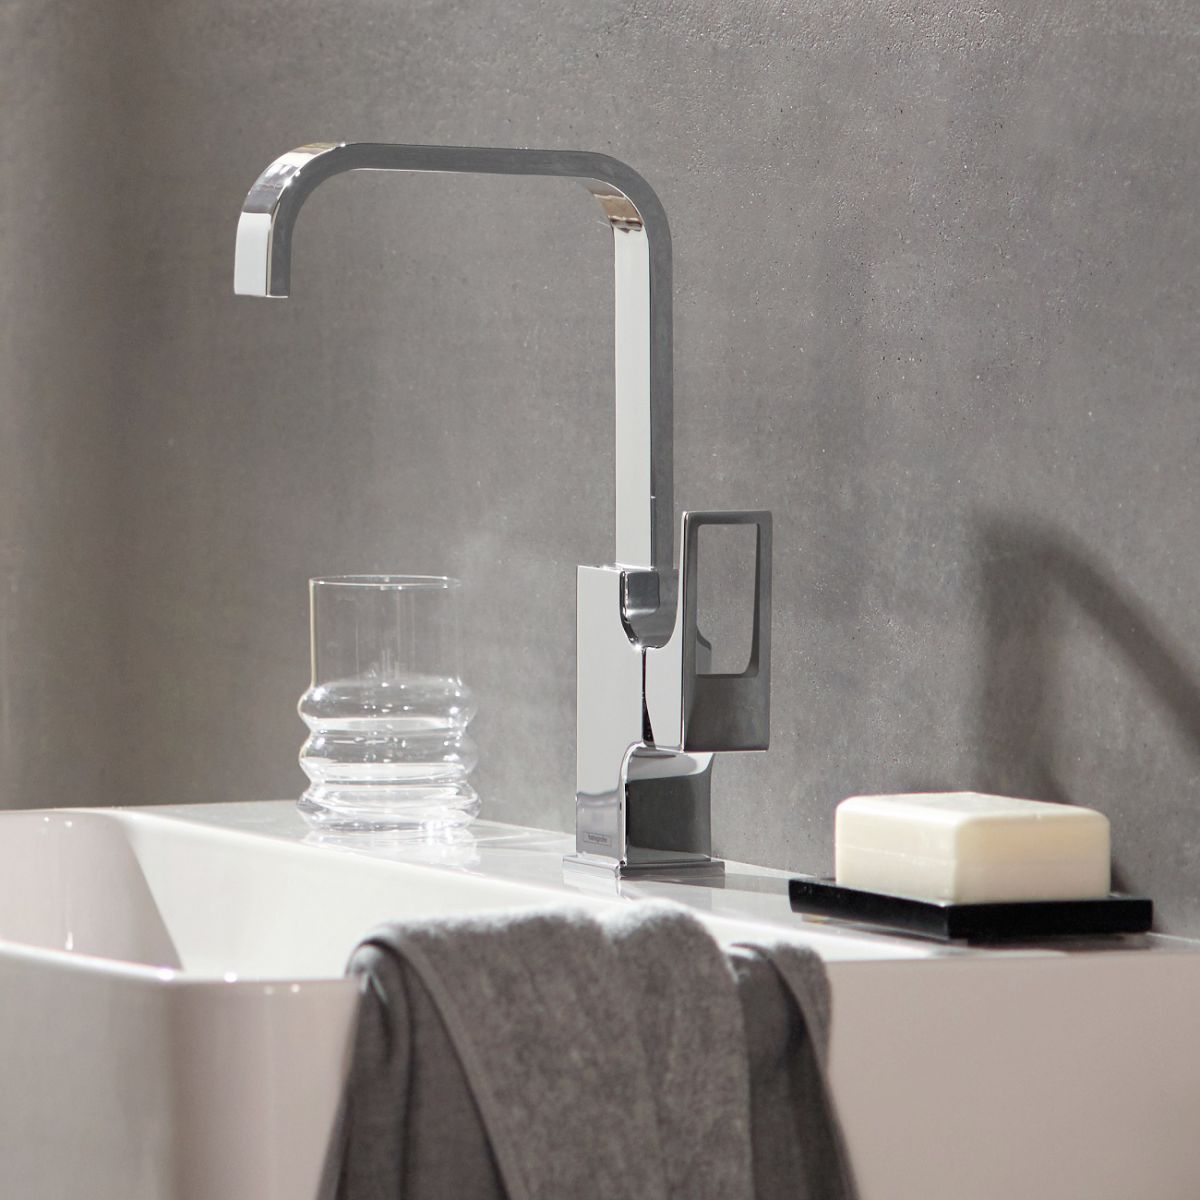 Hansgrohe Metropol 230 Basin Mixer with Loop Handle : UK Bathrooms